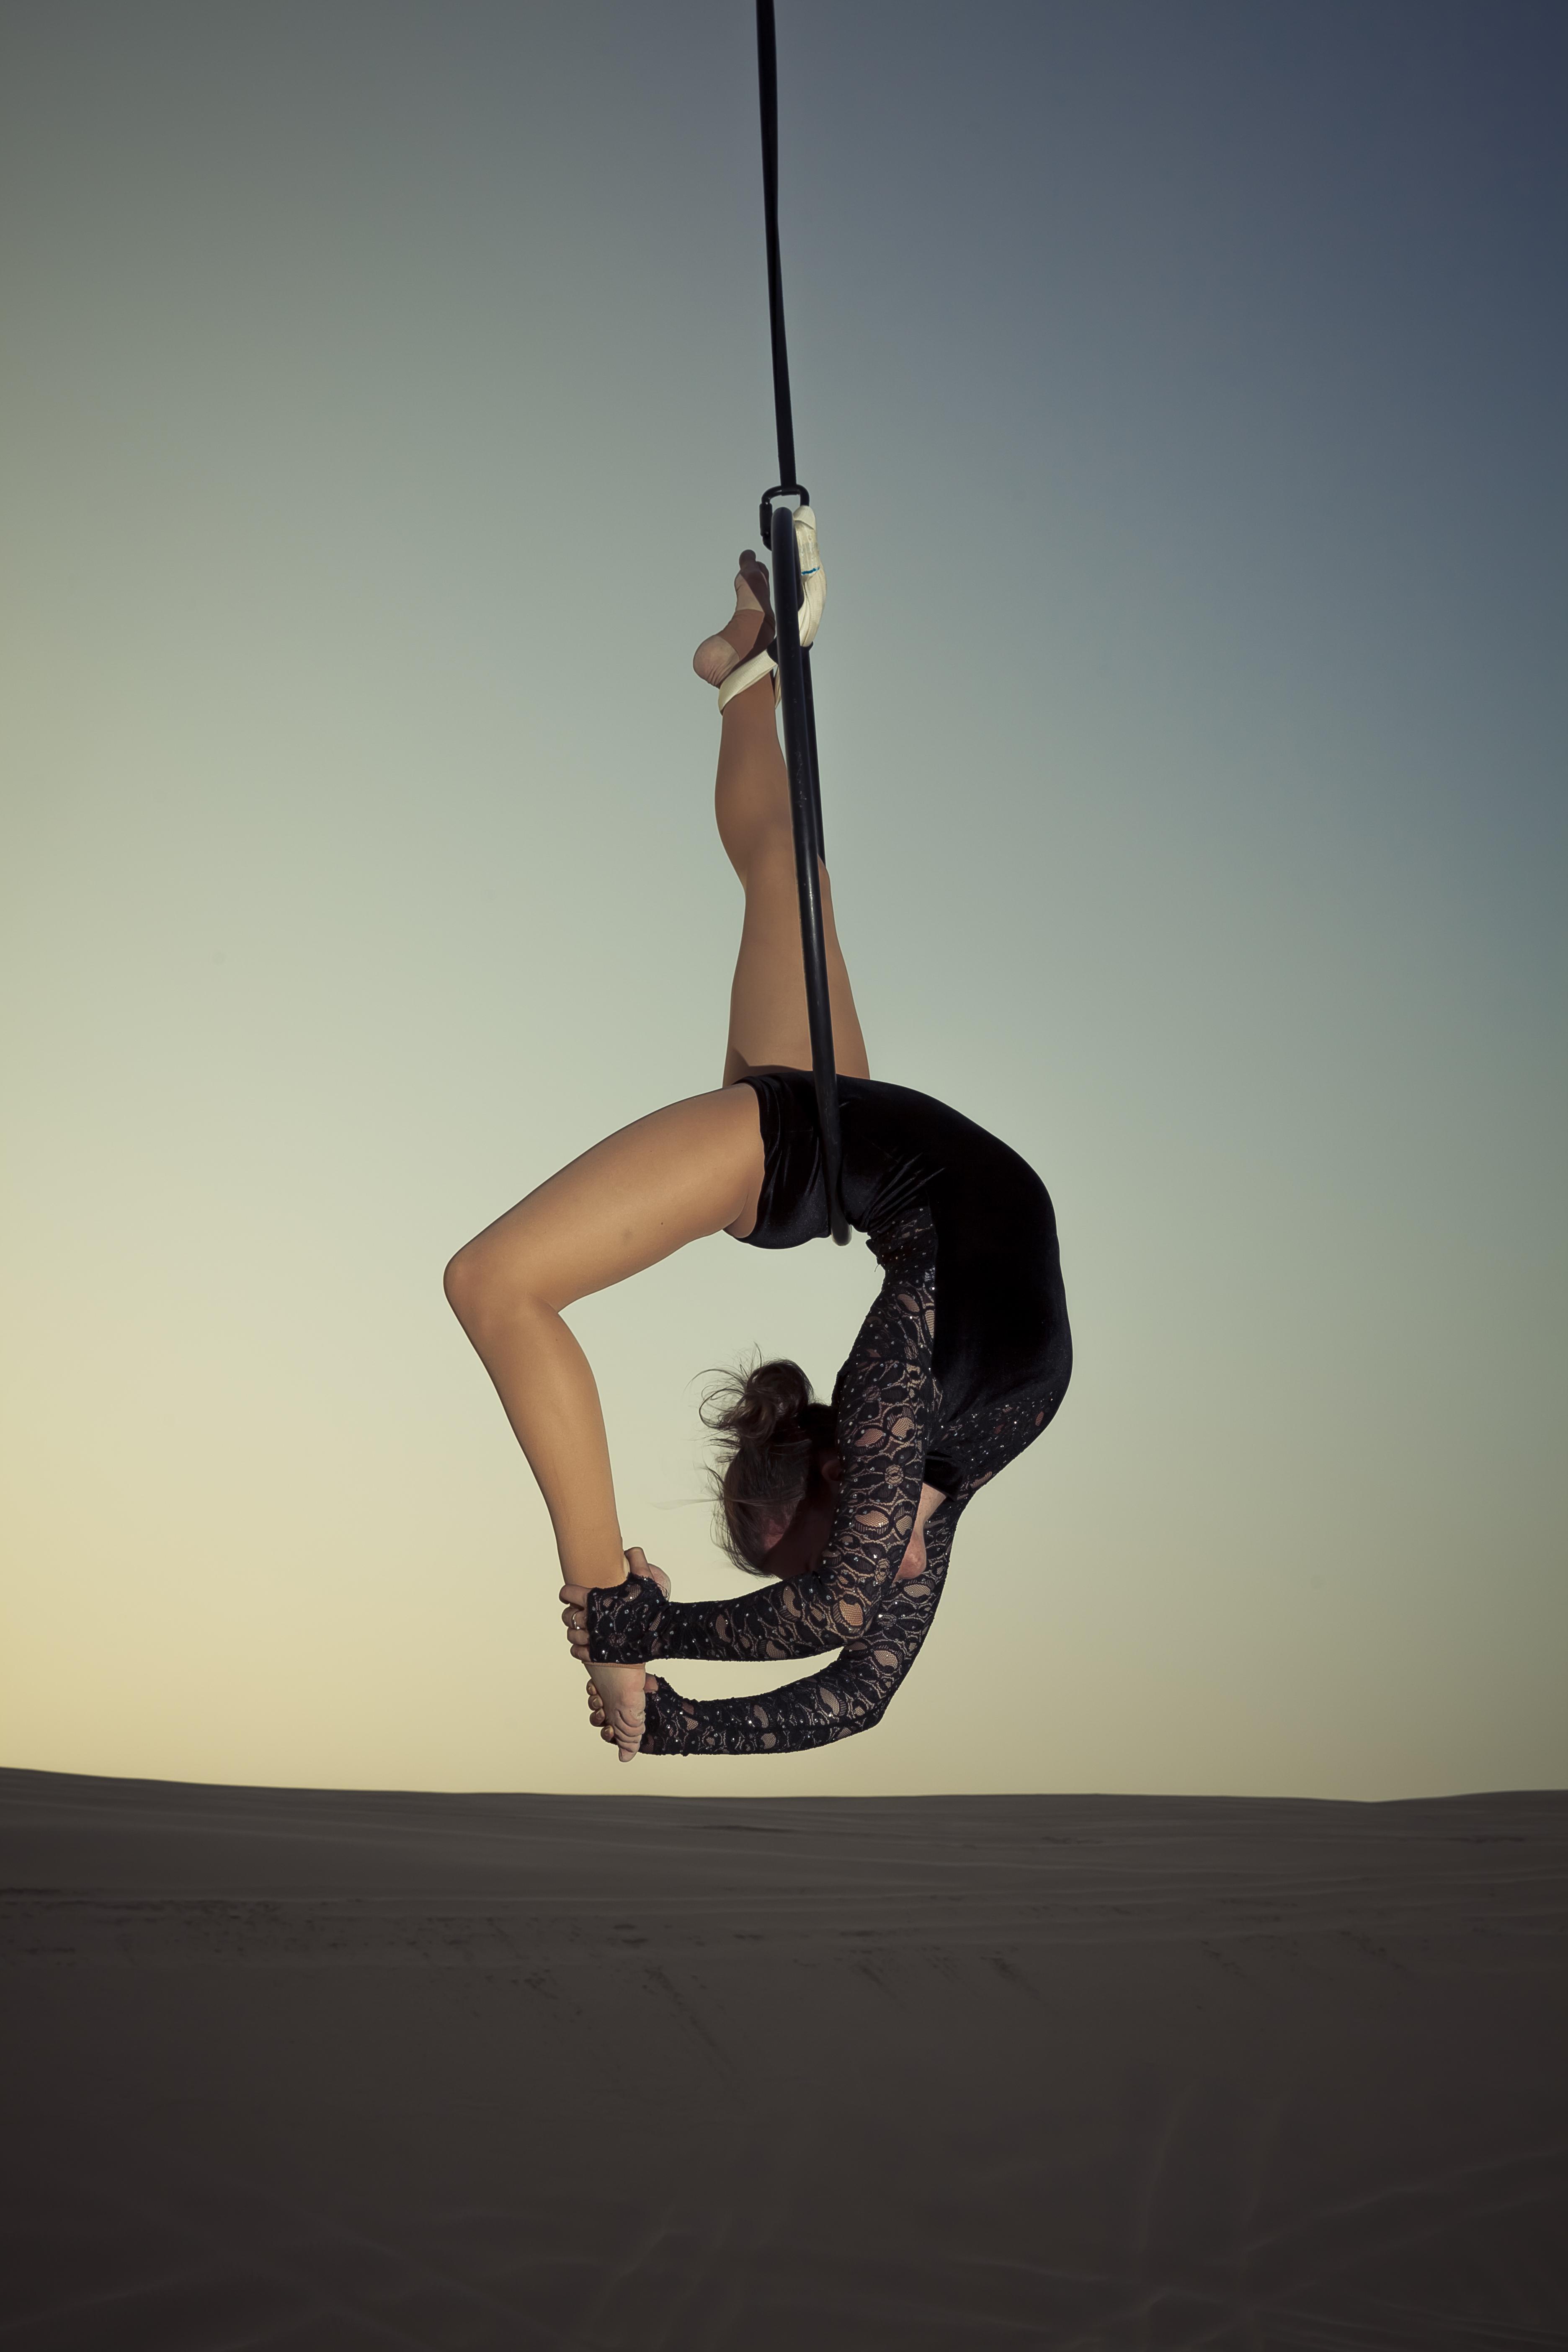 Scorpion hang